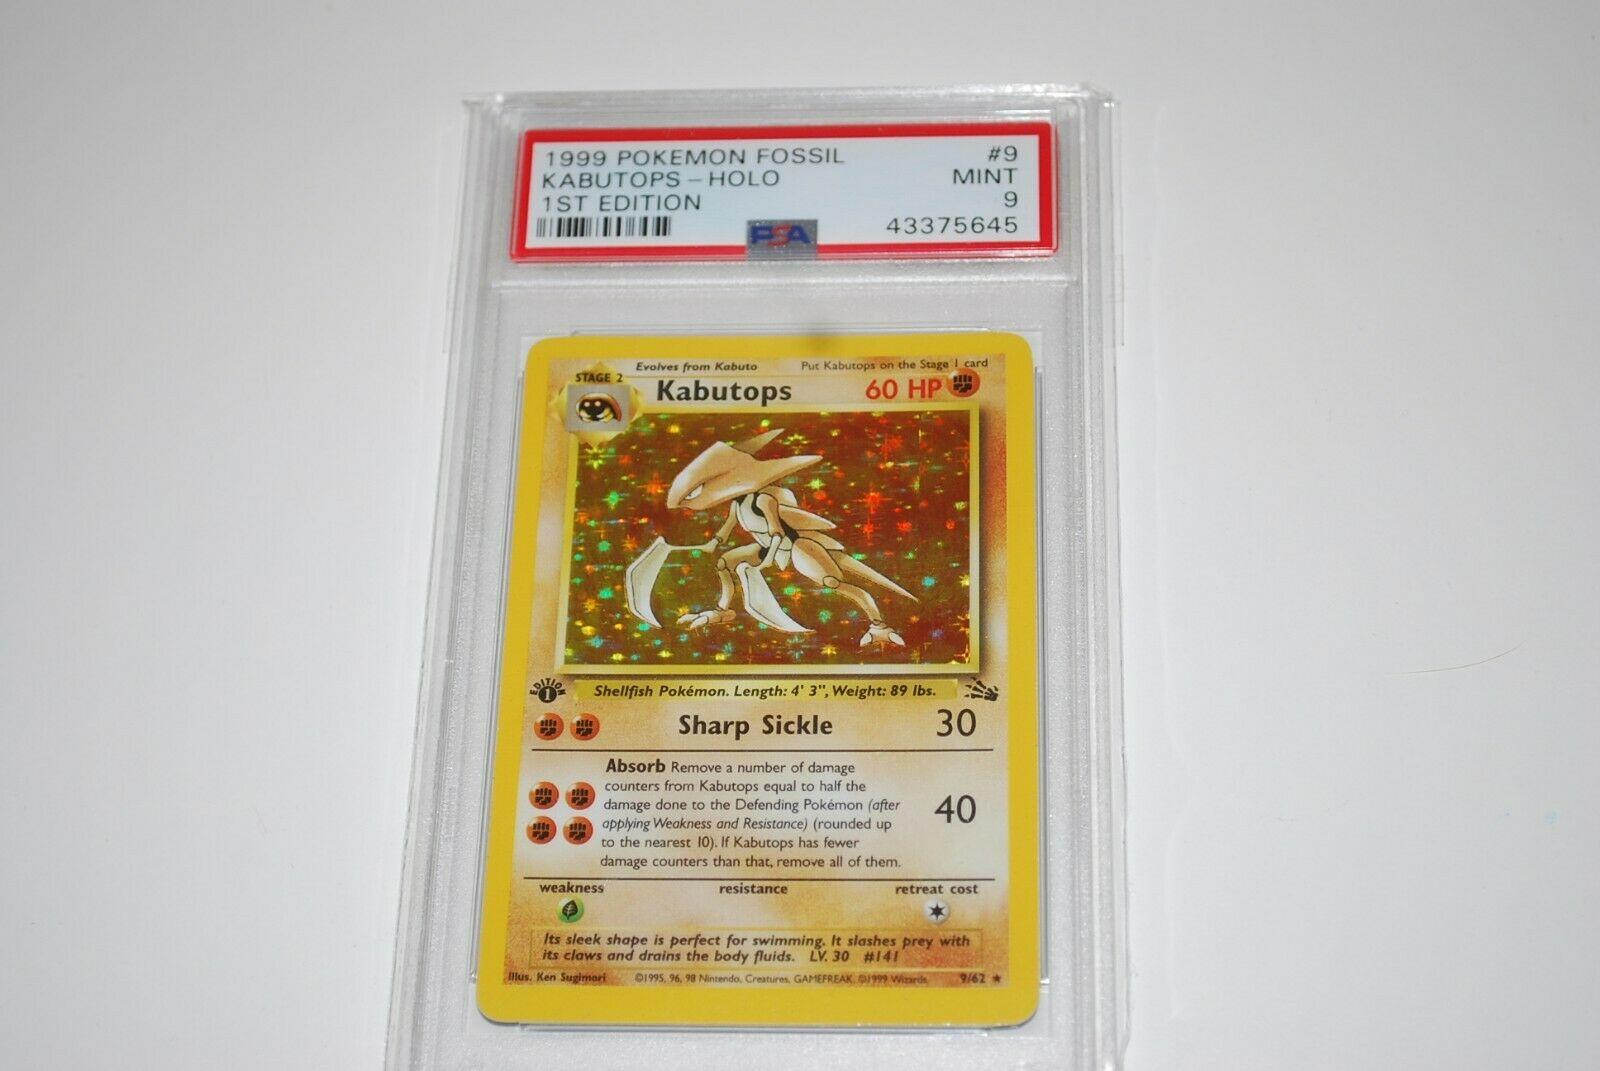 PSA 9 Mint 1st Edition Kabutops Holo 962 Fossil Pokemon Card 1999